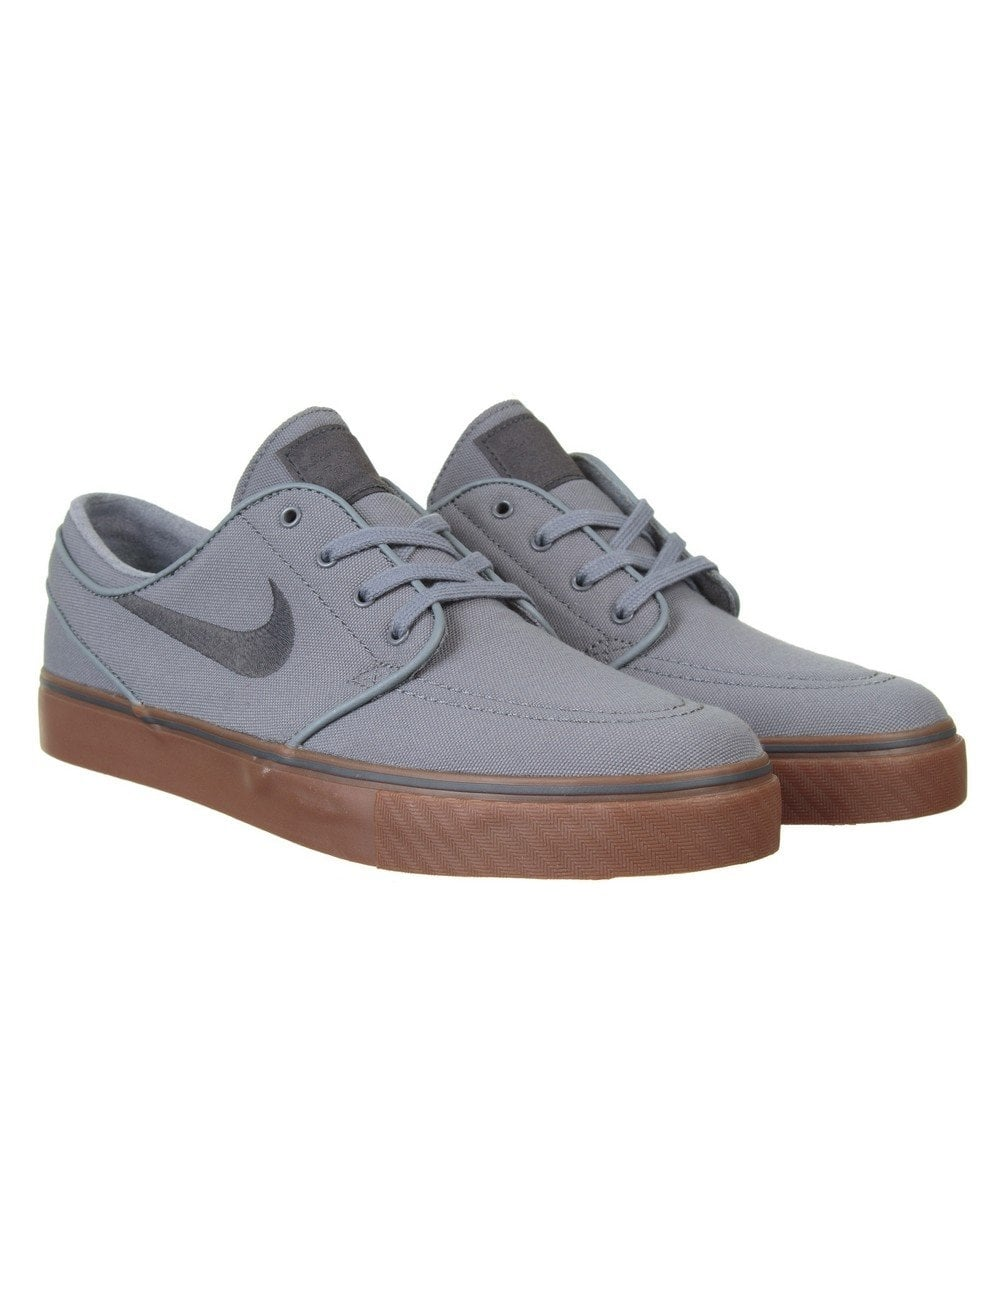 low priced a61db c75b5 Nike SB Stefan Janoski Shoes - Cool GreyGum Sole